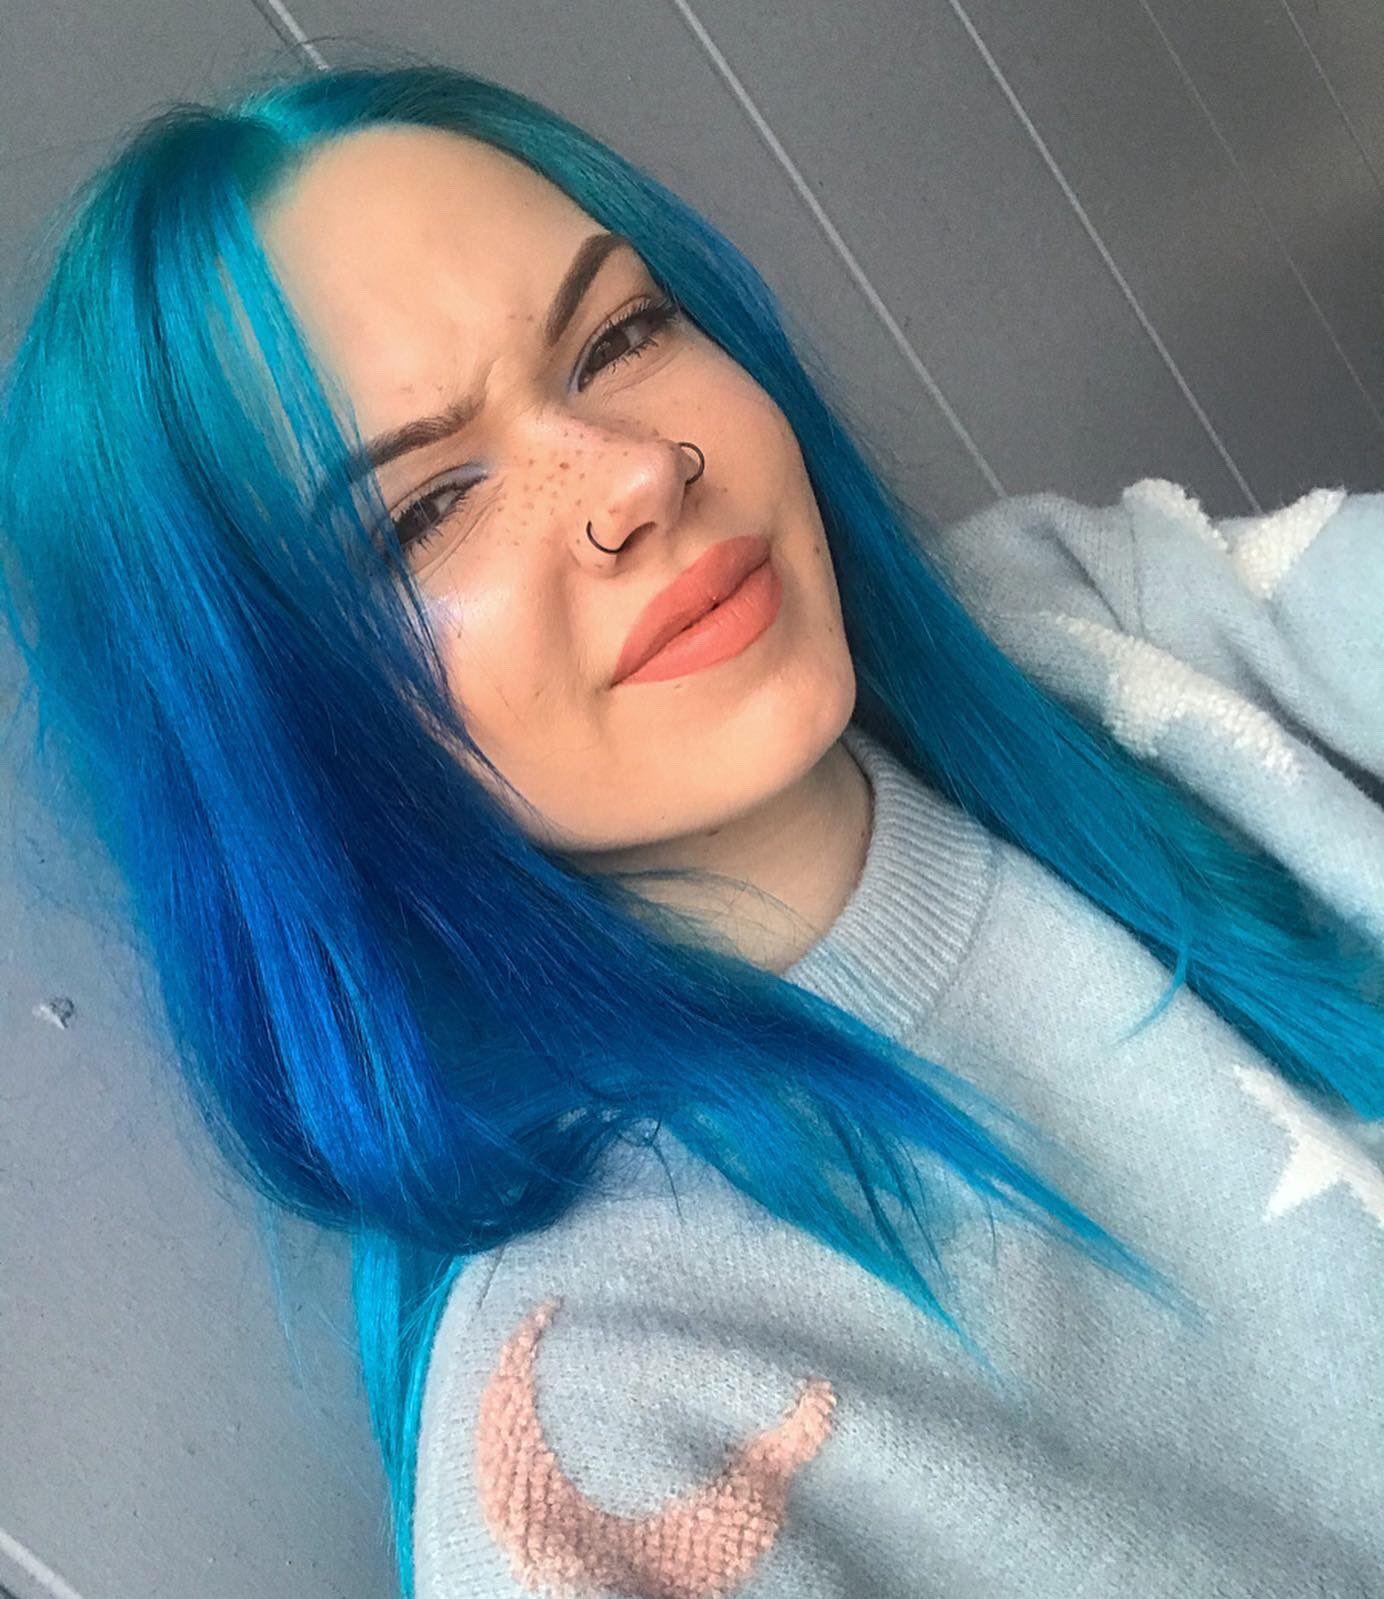 Billie Dawn Ingle On Twitter In 2020 Bright Blue Hair Blue Hair Aesthetic Blue Hair